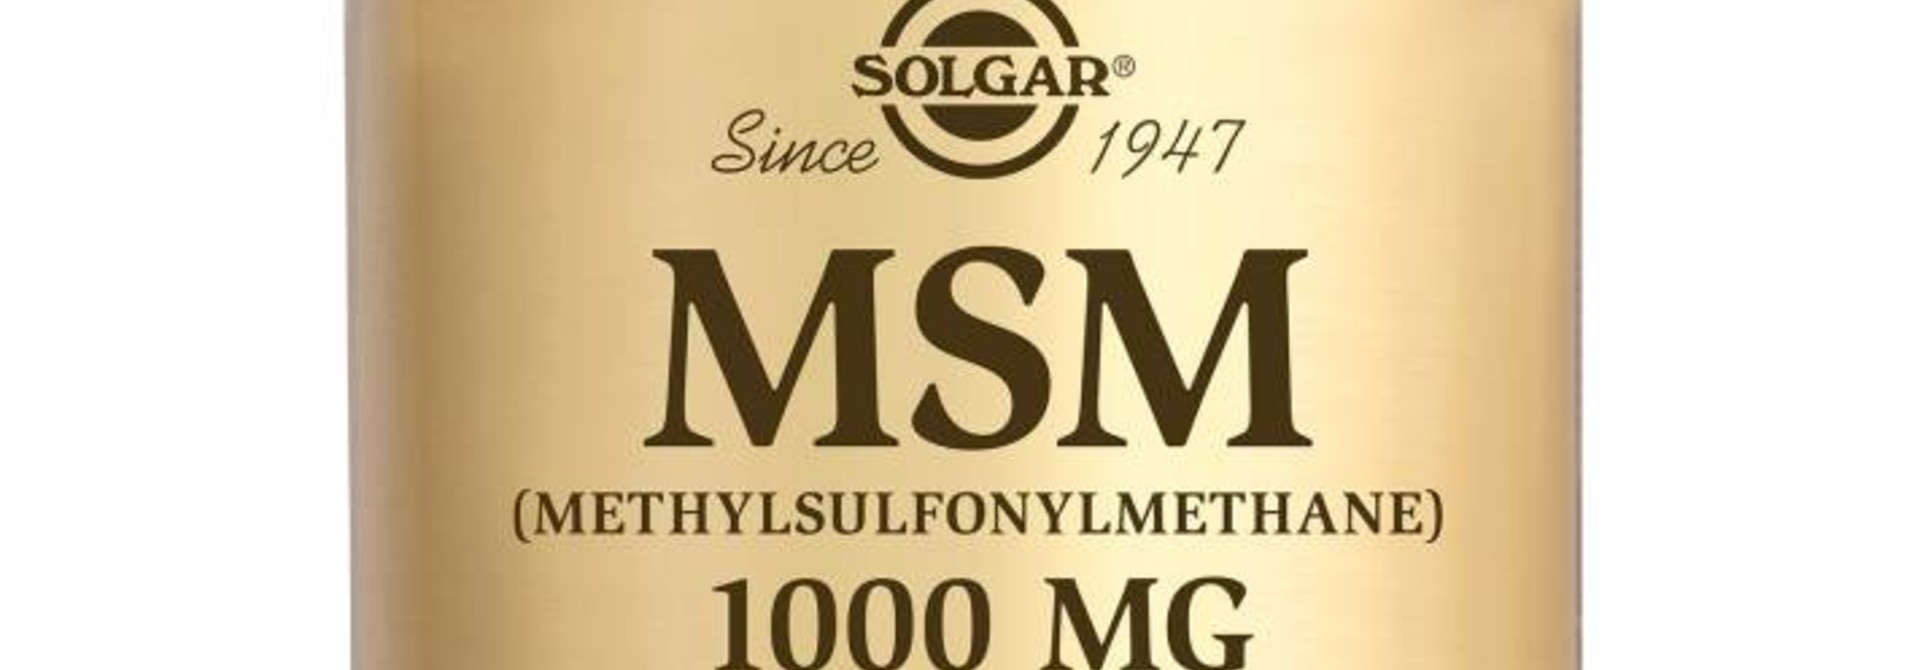 MSM 1000 mg 60 tabletten